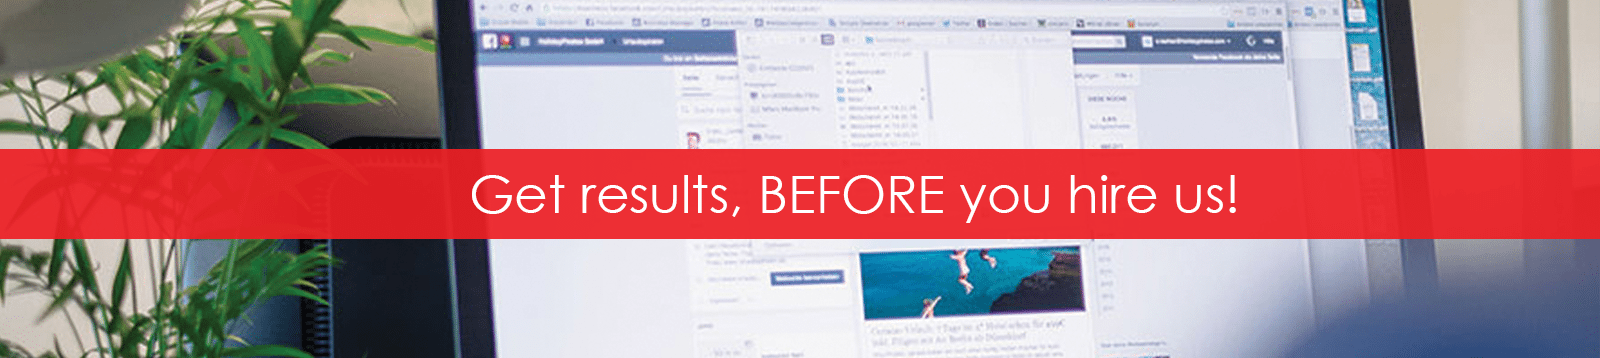 get-results-banner